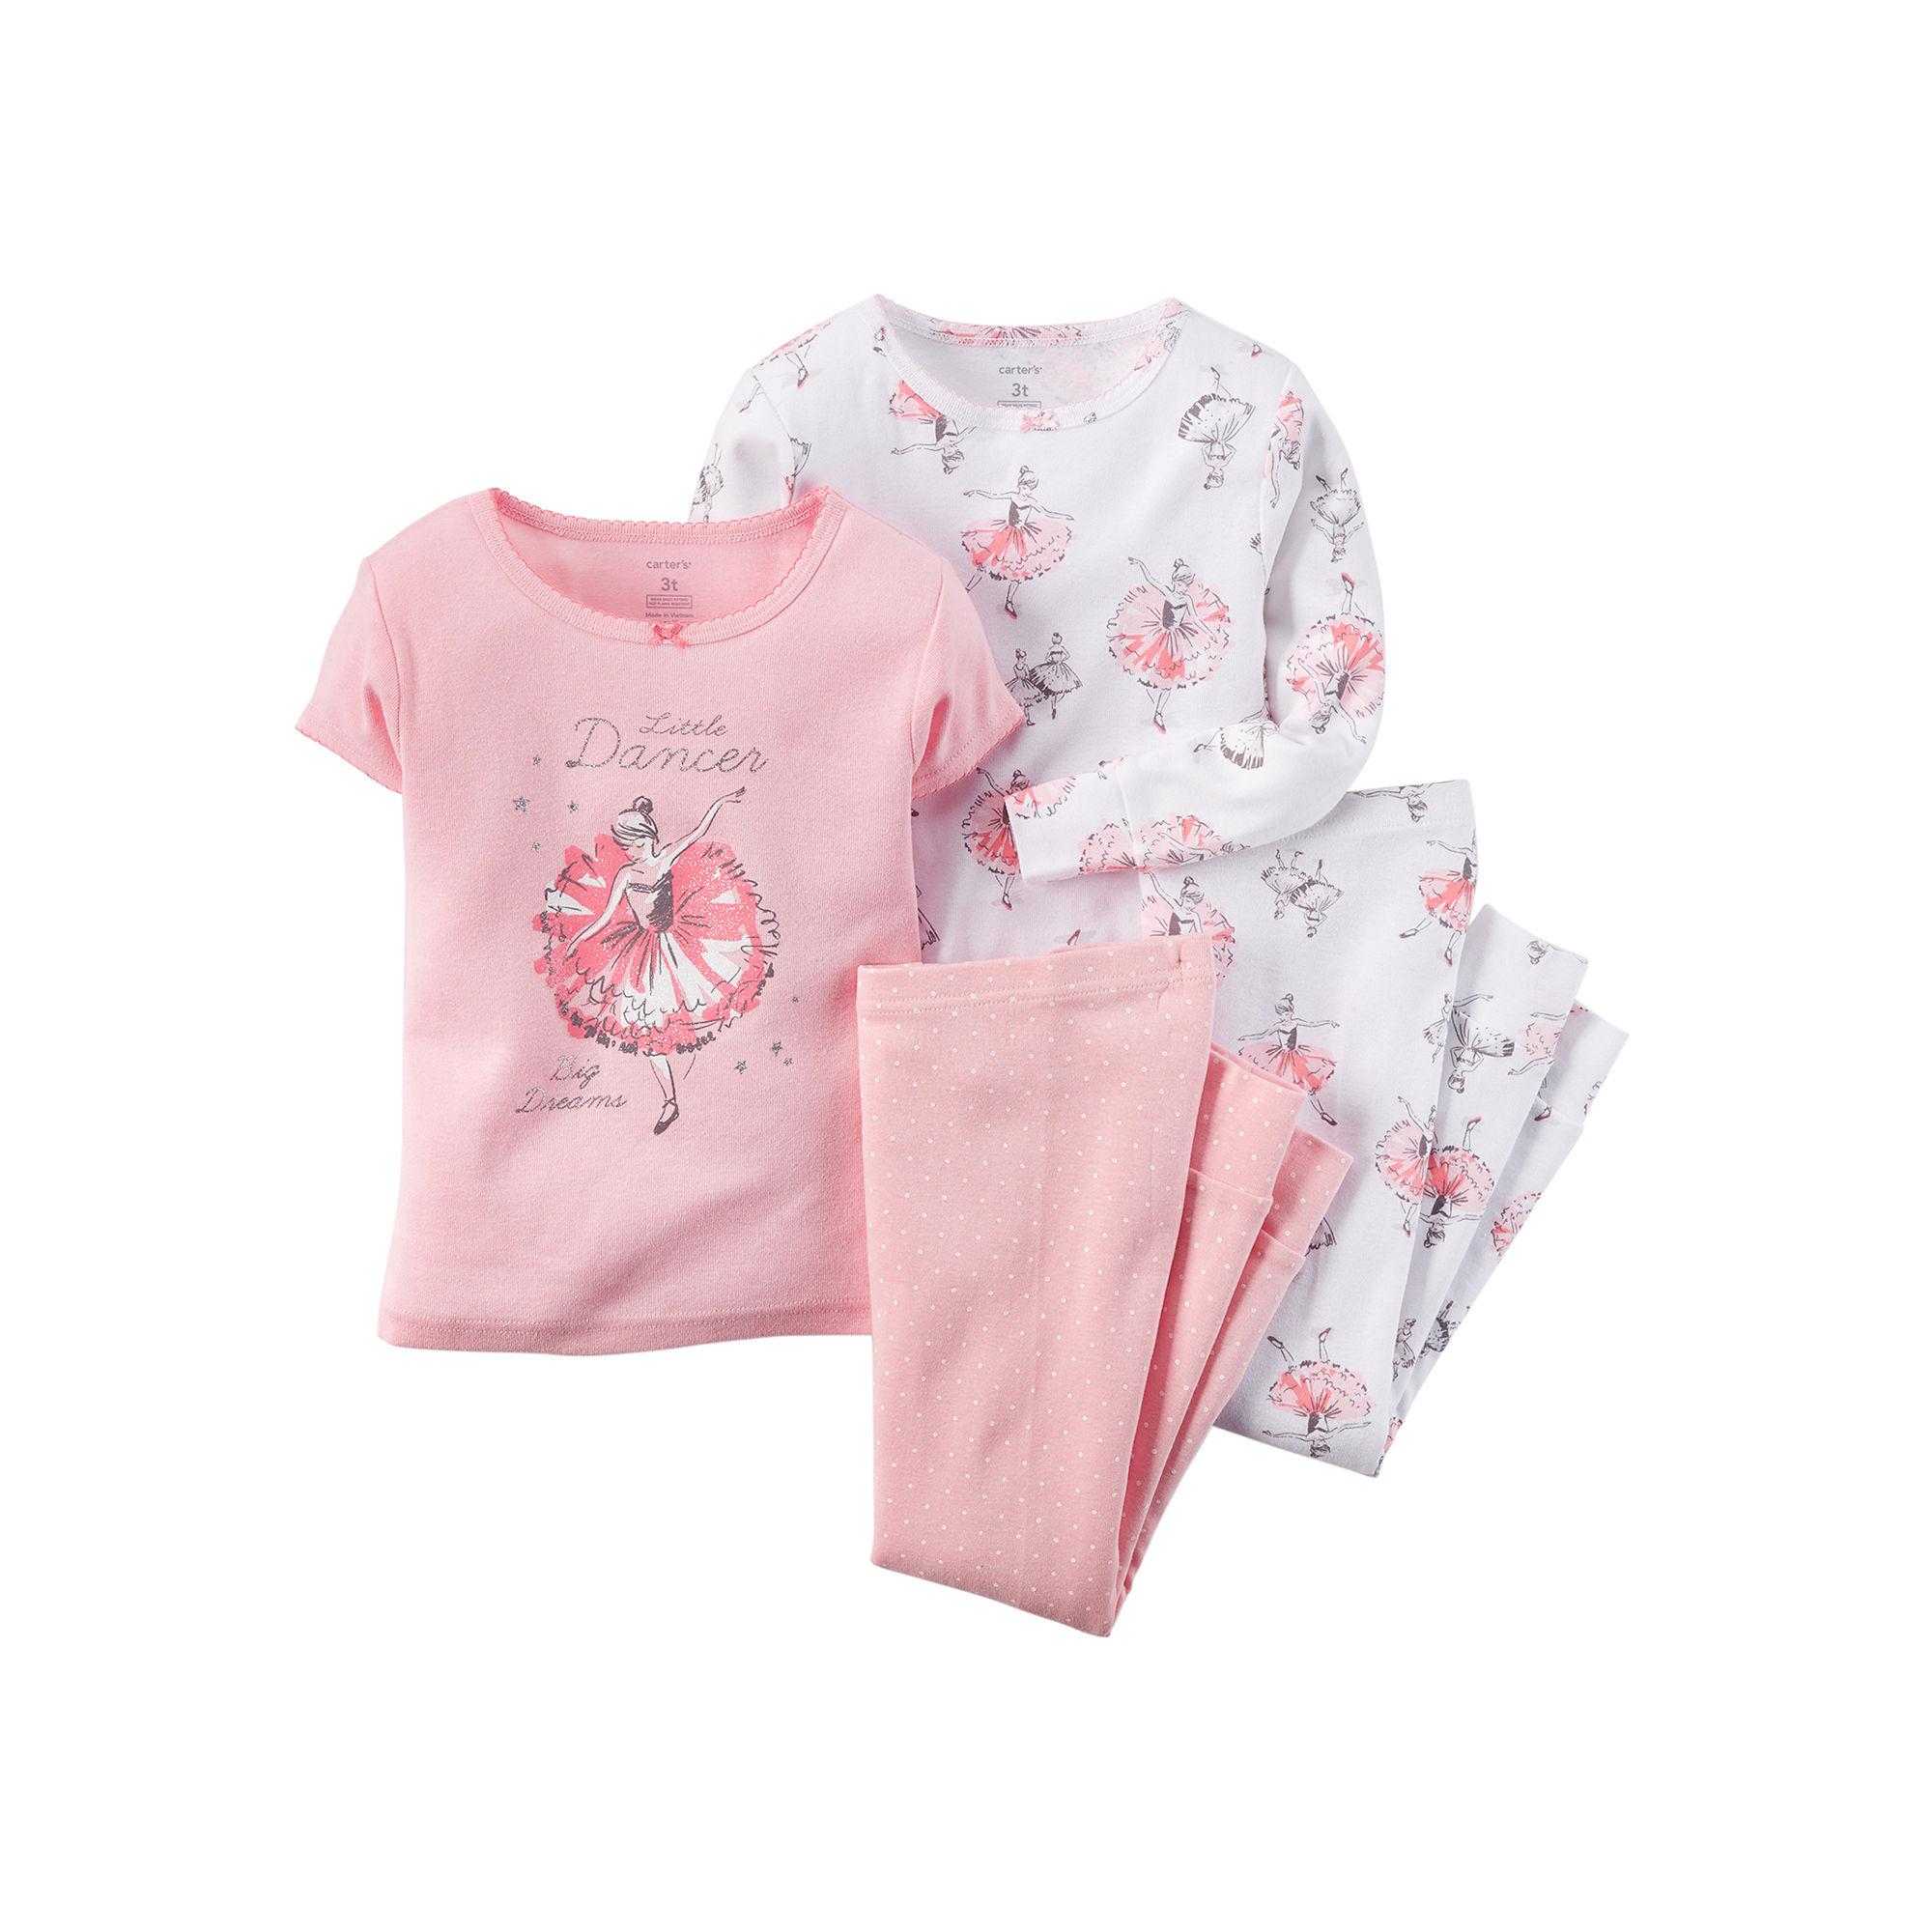 2ecc3a13c UPC 888510777243 - Carter s 4-pc. Ballerina Pajama Set - Baby Girls ...